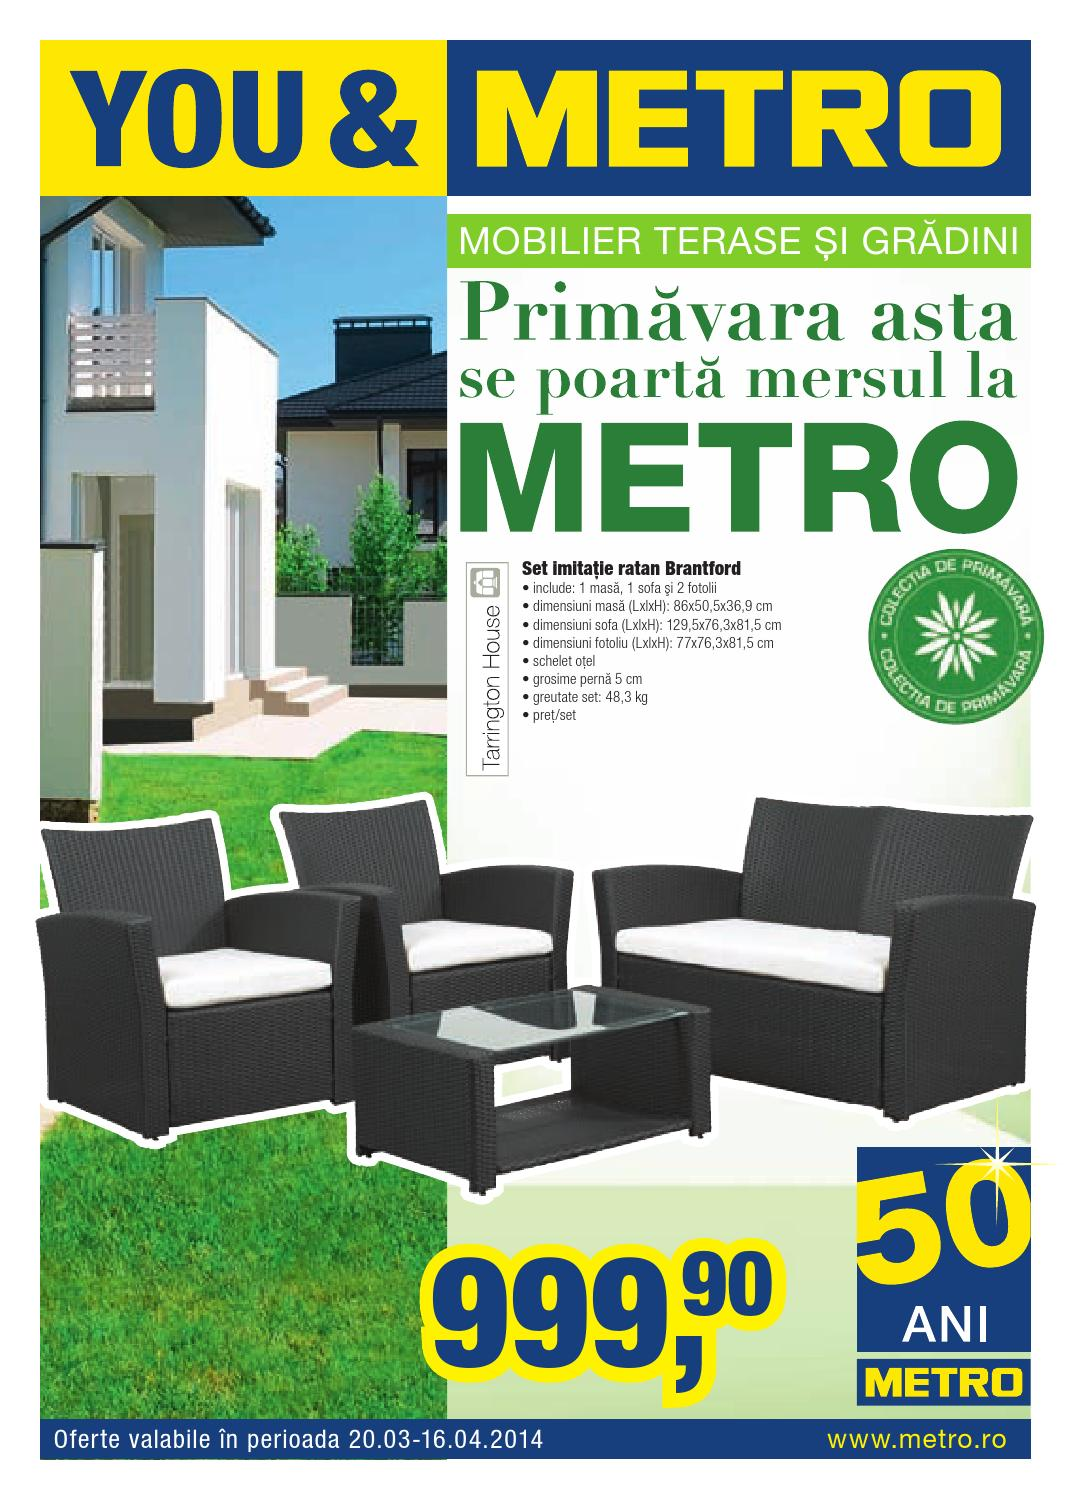 Cataloagele Metro Oferte Mobilier Terase Si Gradini By Catalog Oferta Com Issuu